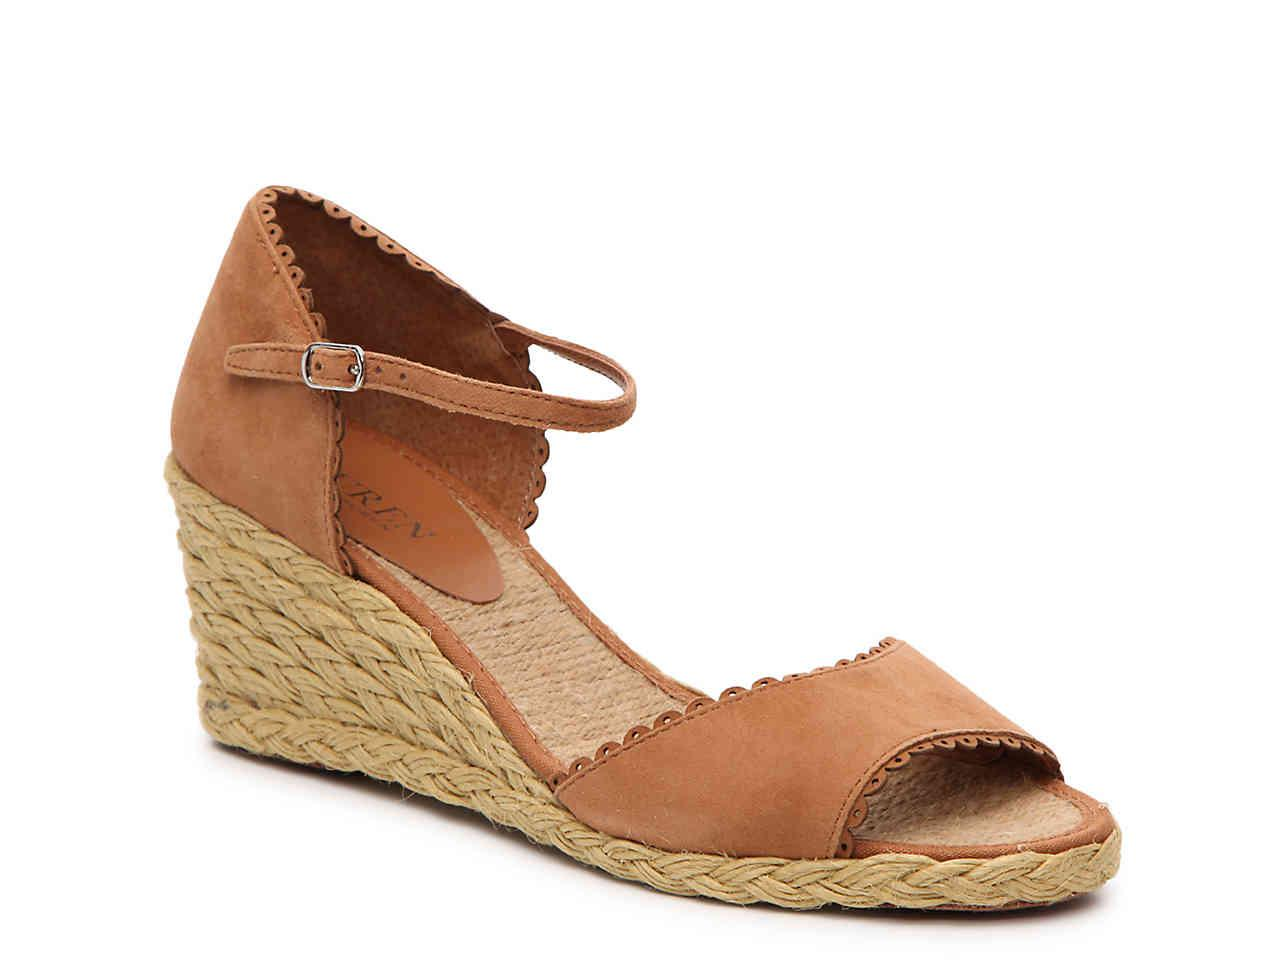 Sandal Chrissie Brown Ralph Lauren Wedge By uZTPkXiO